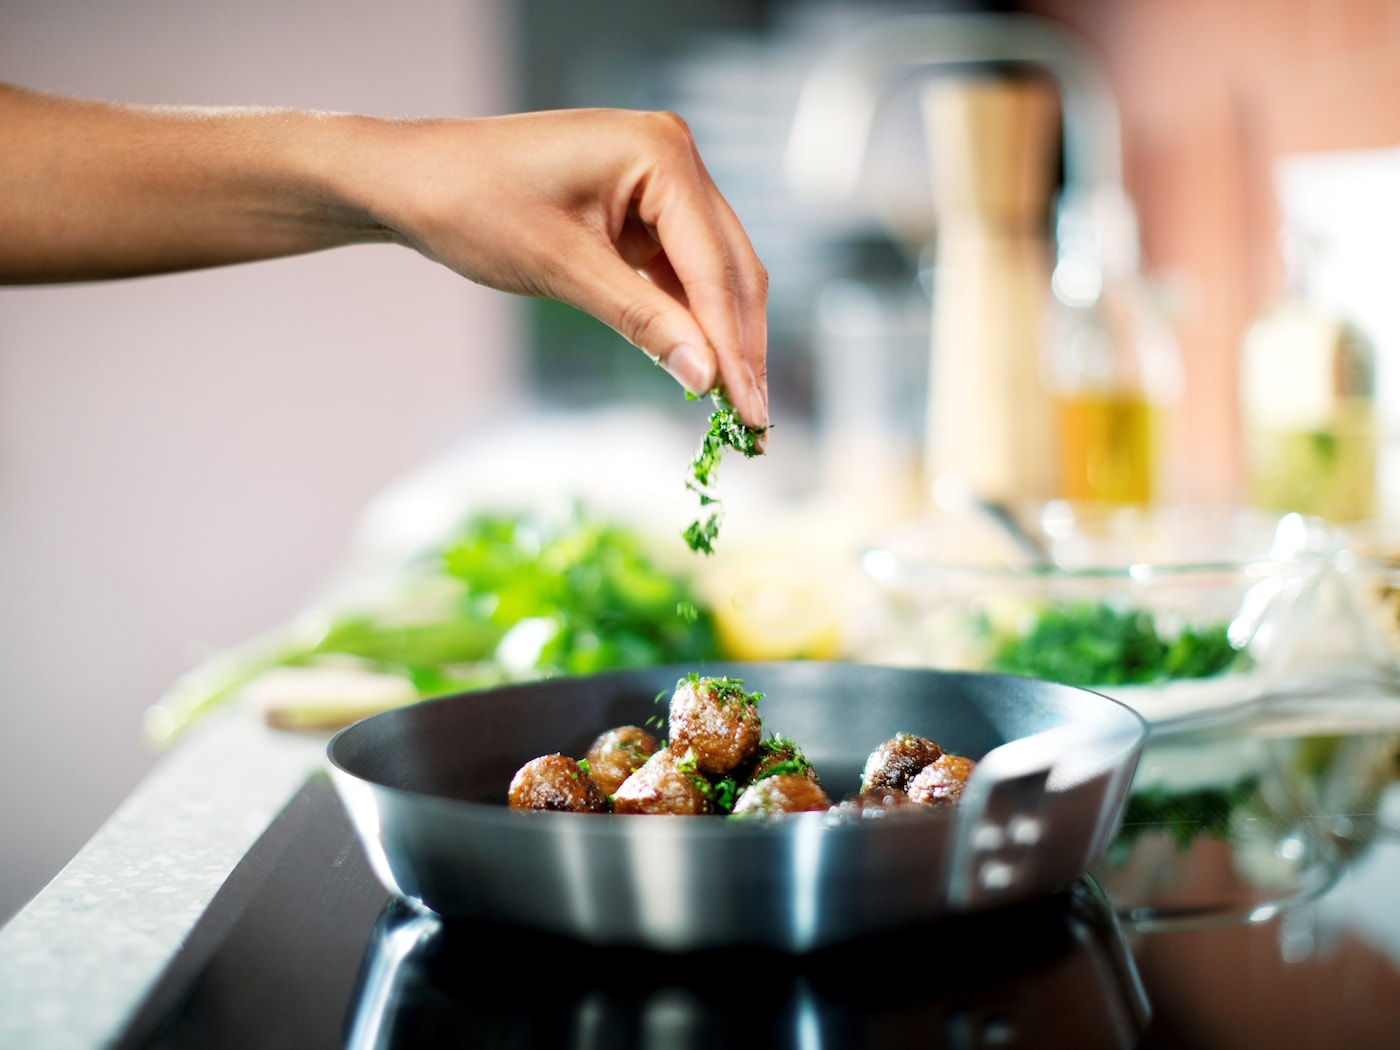 En hånd krydrer HUVUDROLL plantebaserede boller i en IKEA 365+ stegepande.